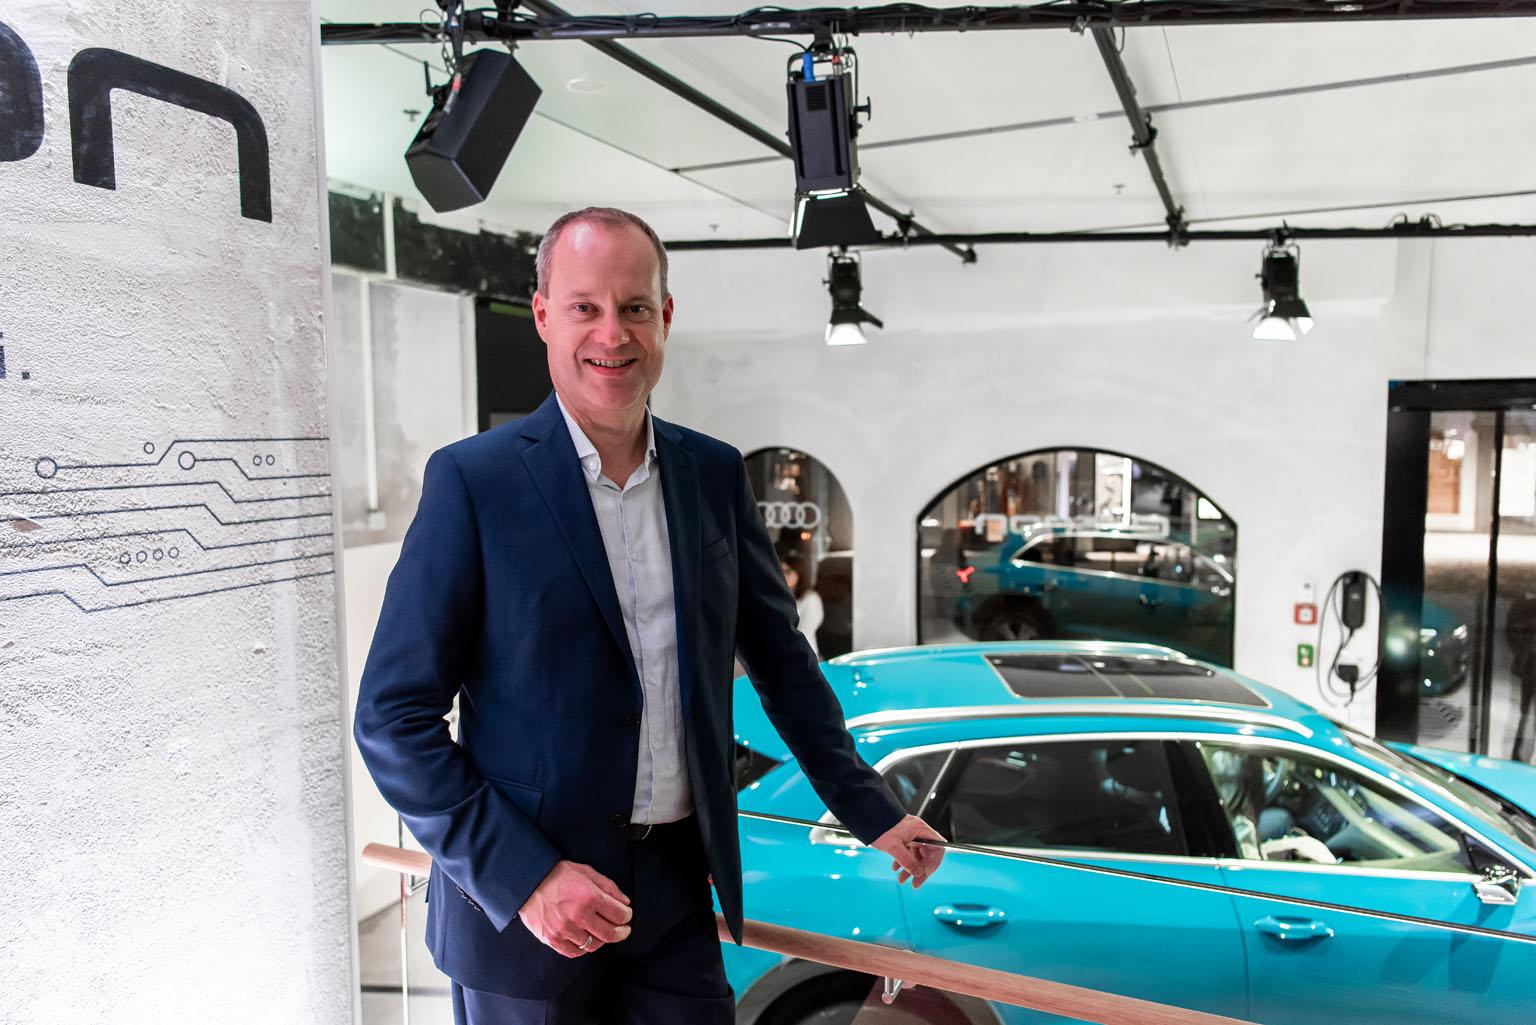 Jens van Eikels nell'Audi e-tron pop-up store di Zurigo. (Tom Lüthi)